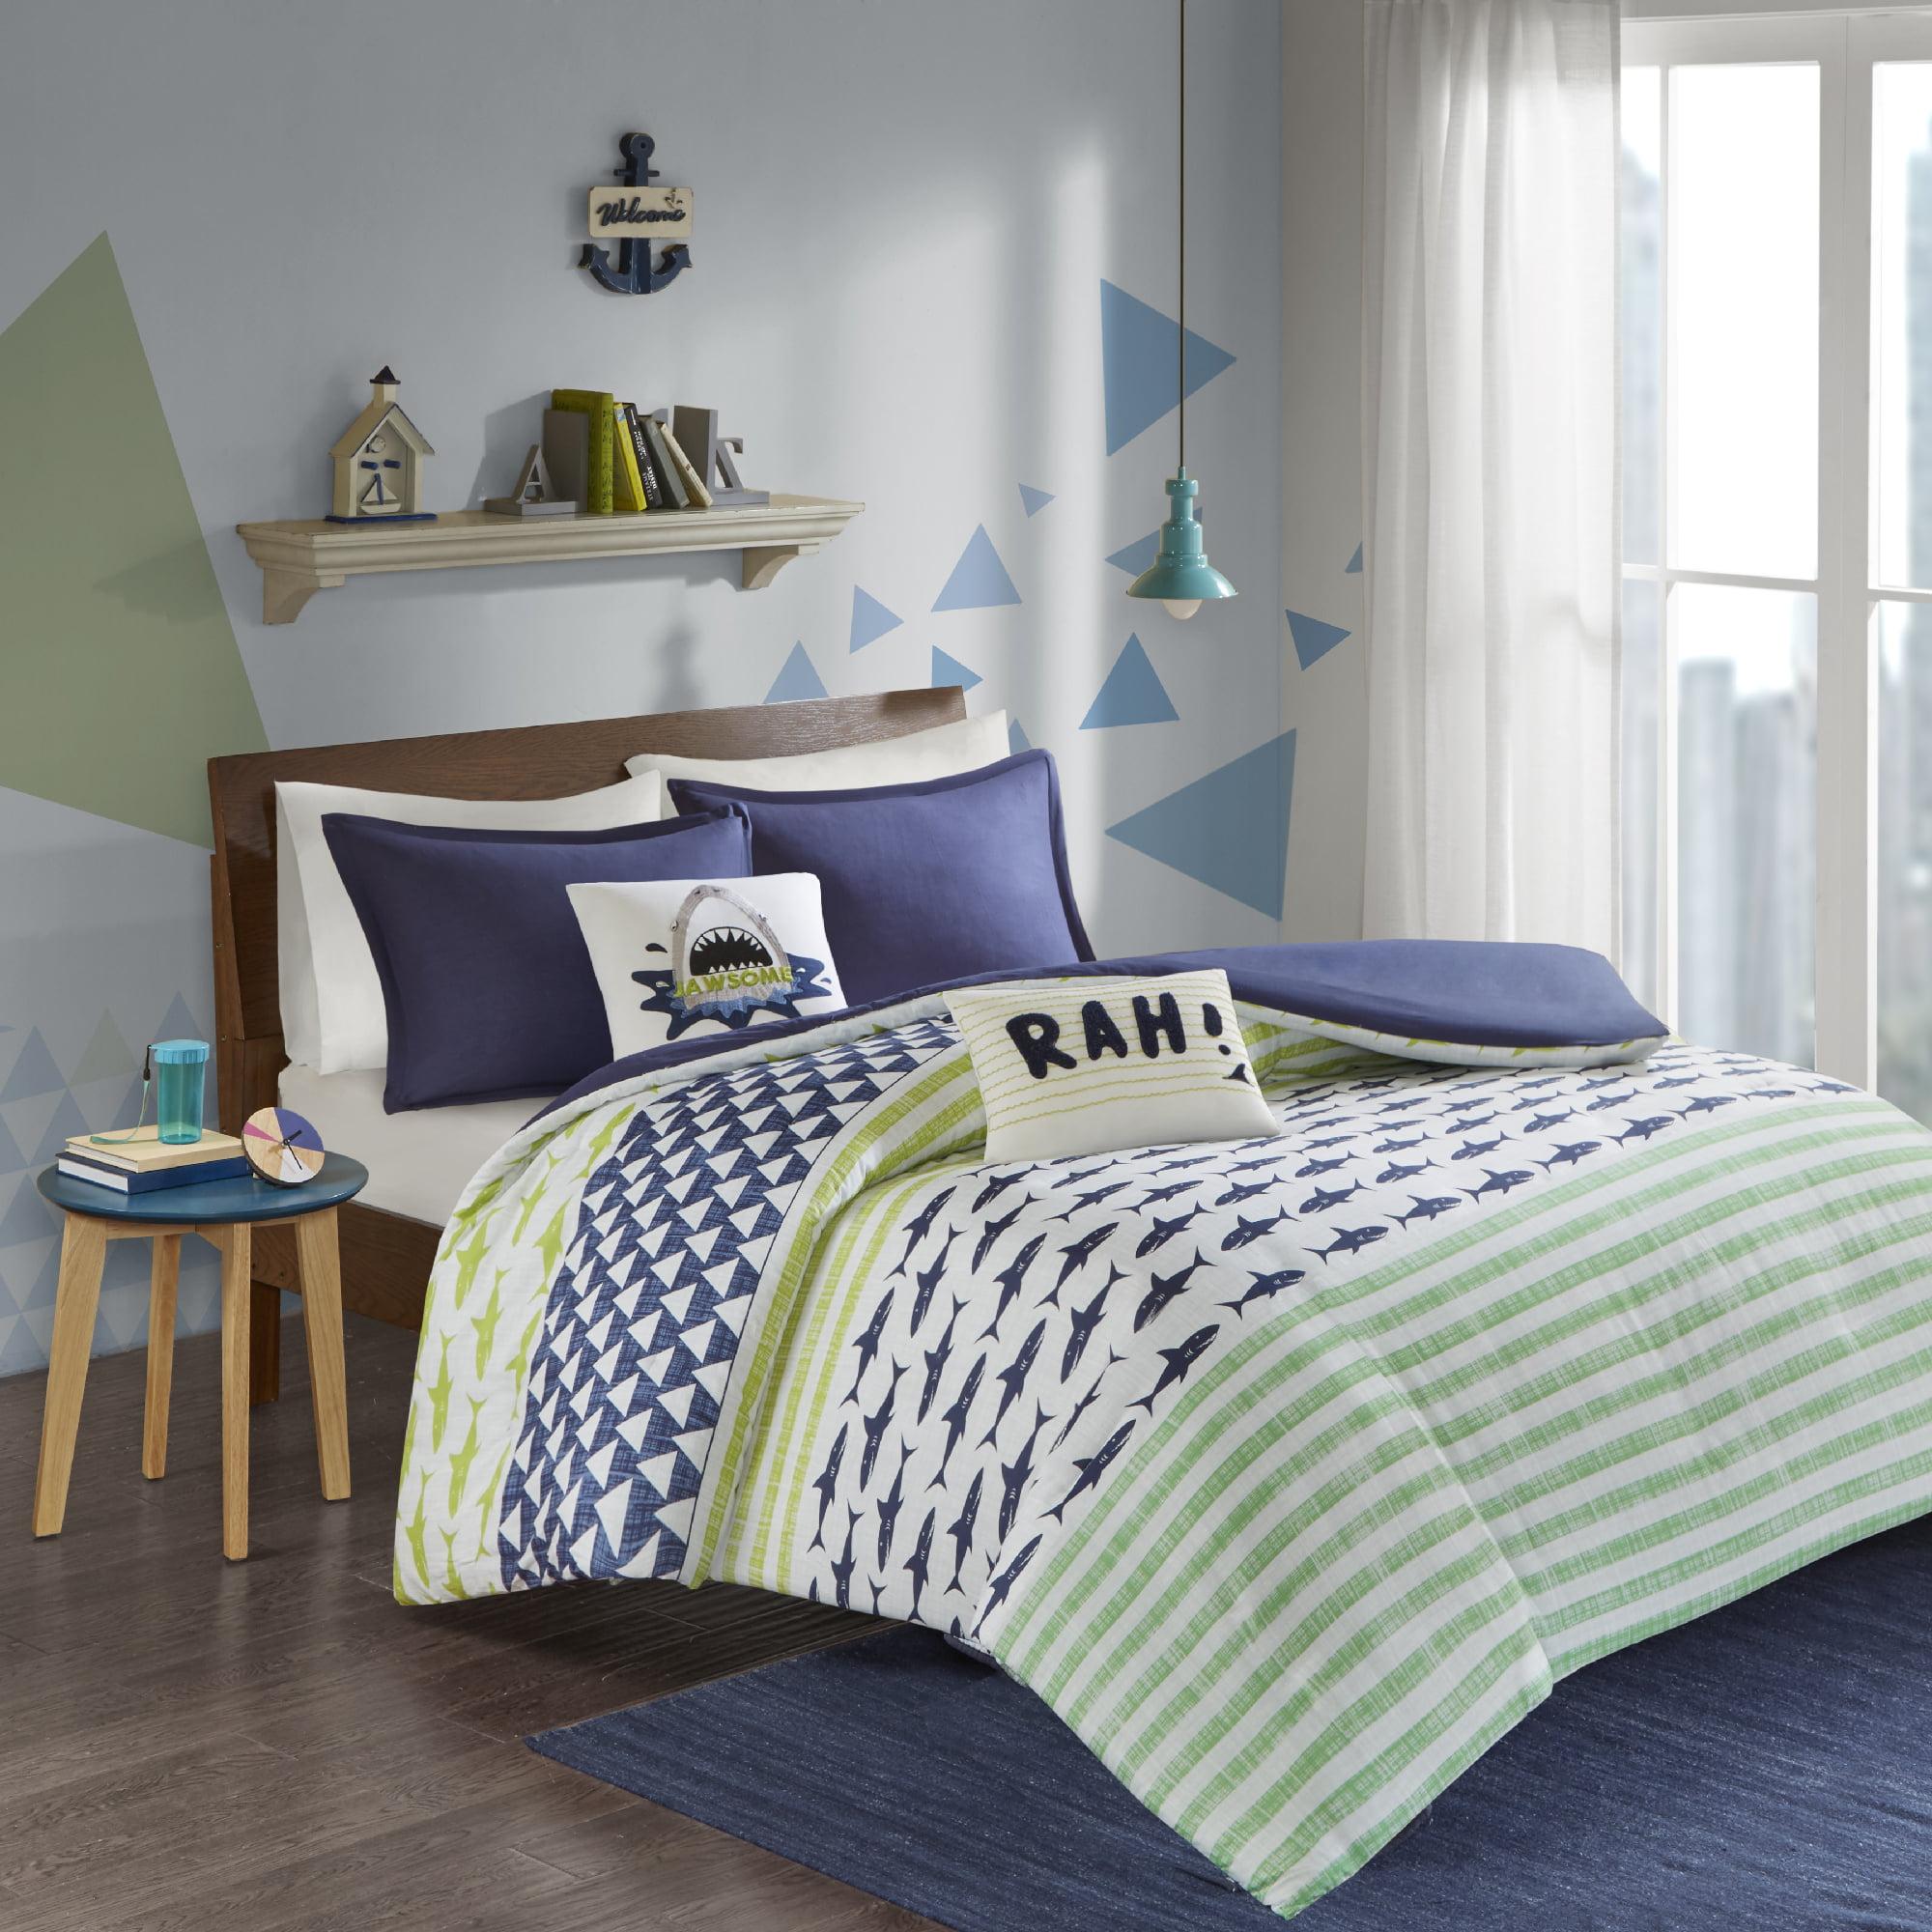 Home Essence Kids Luke Shark Printed Cotton Duvet Cover Set